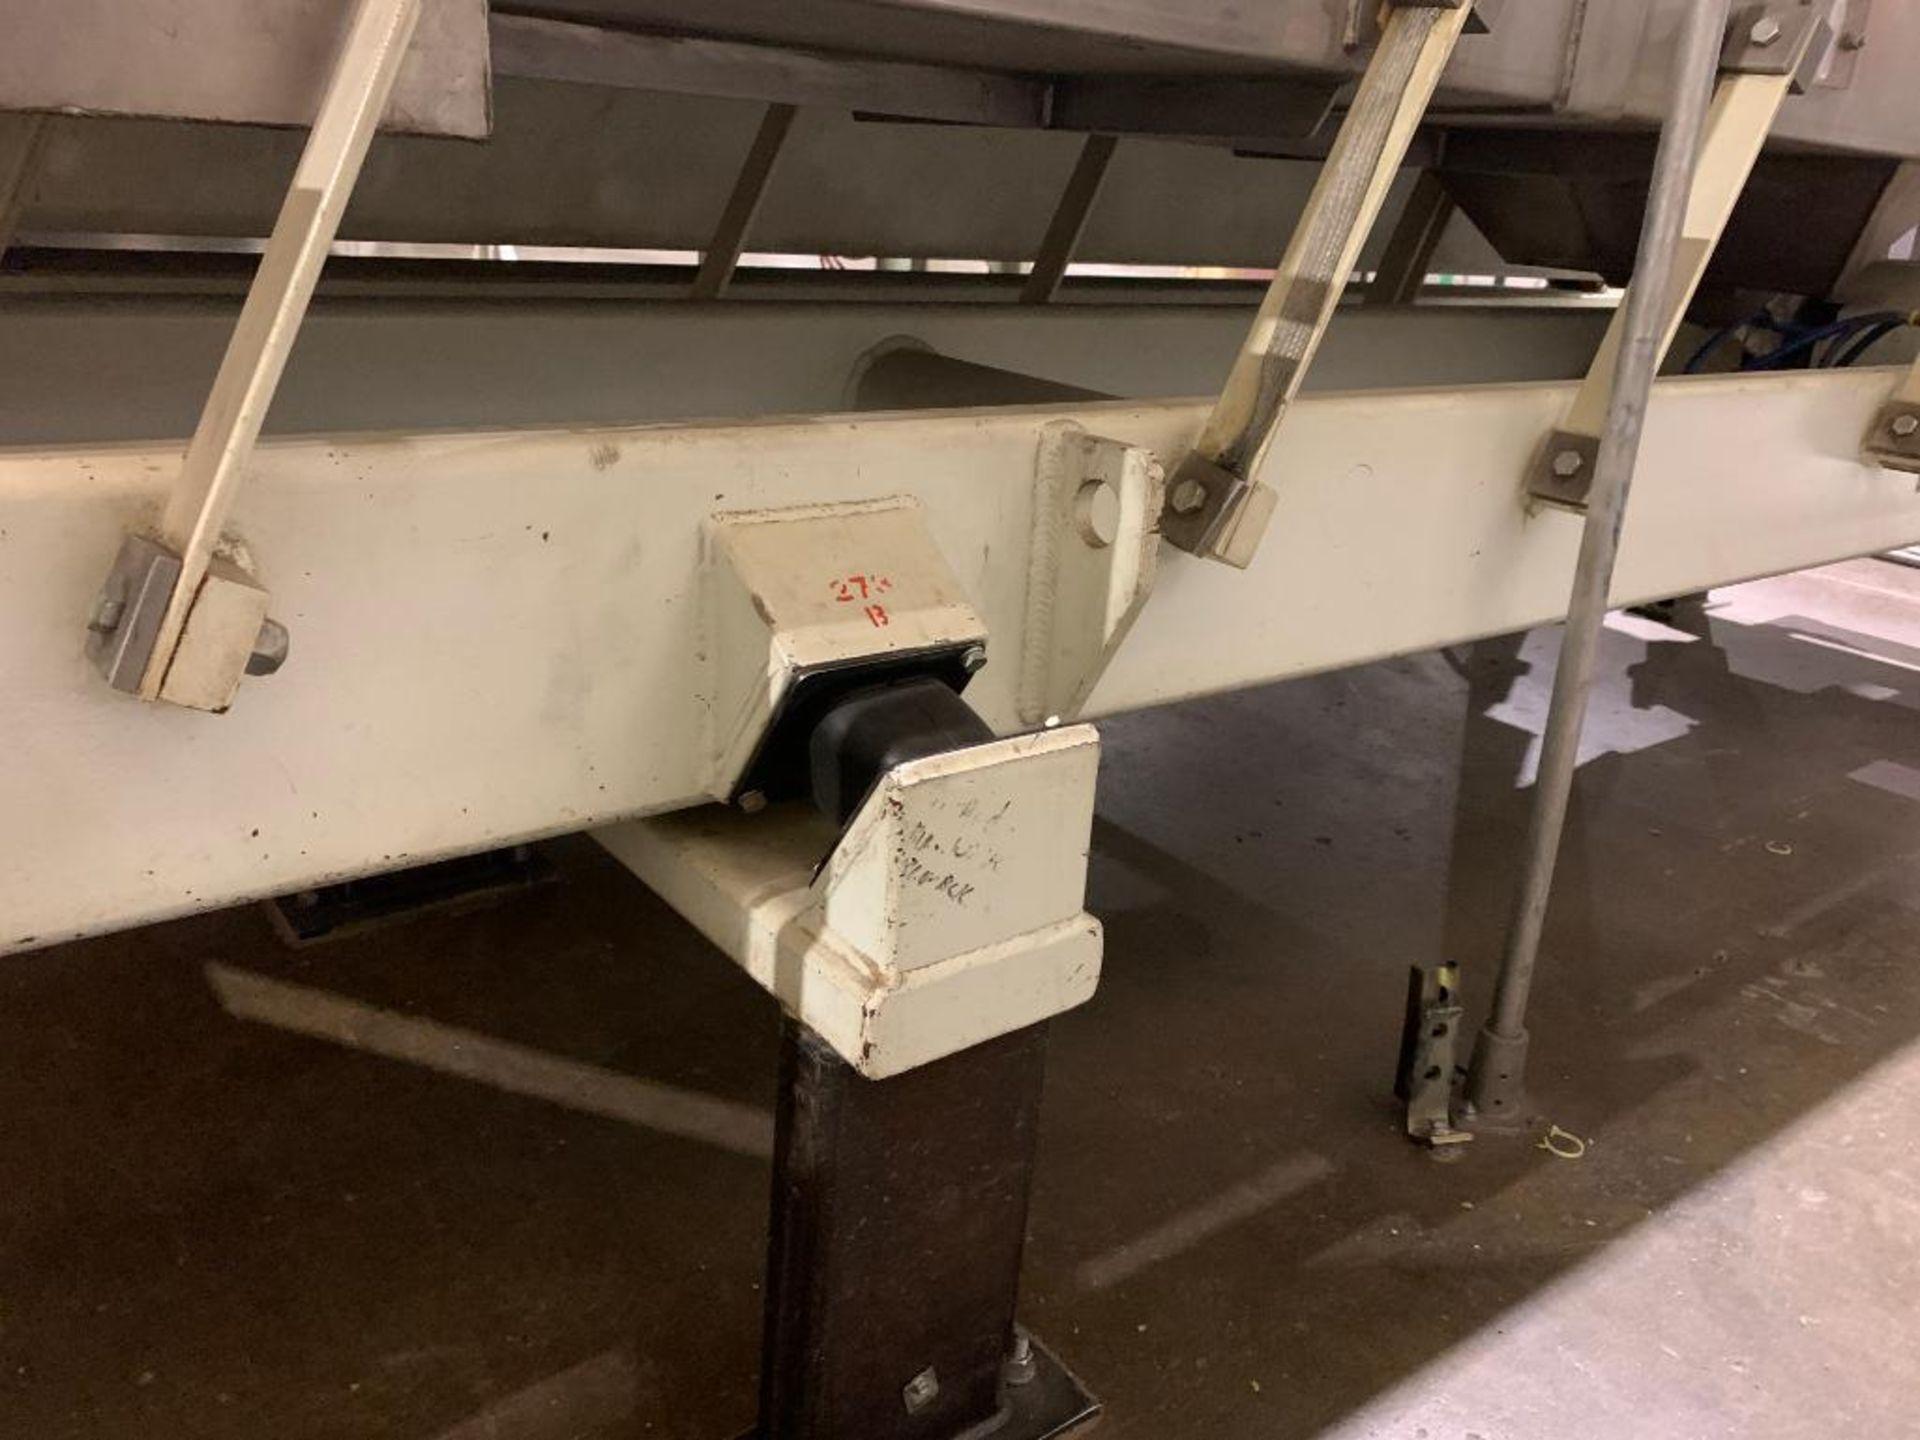 1992 Link-Belt vibratory conveyor, model LBL2405-10X12-10 - Image 11 of 34